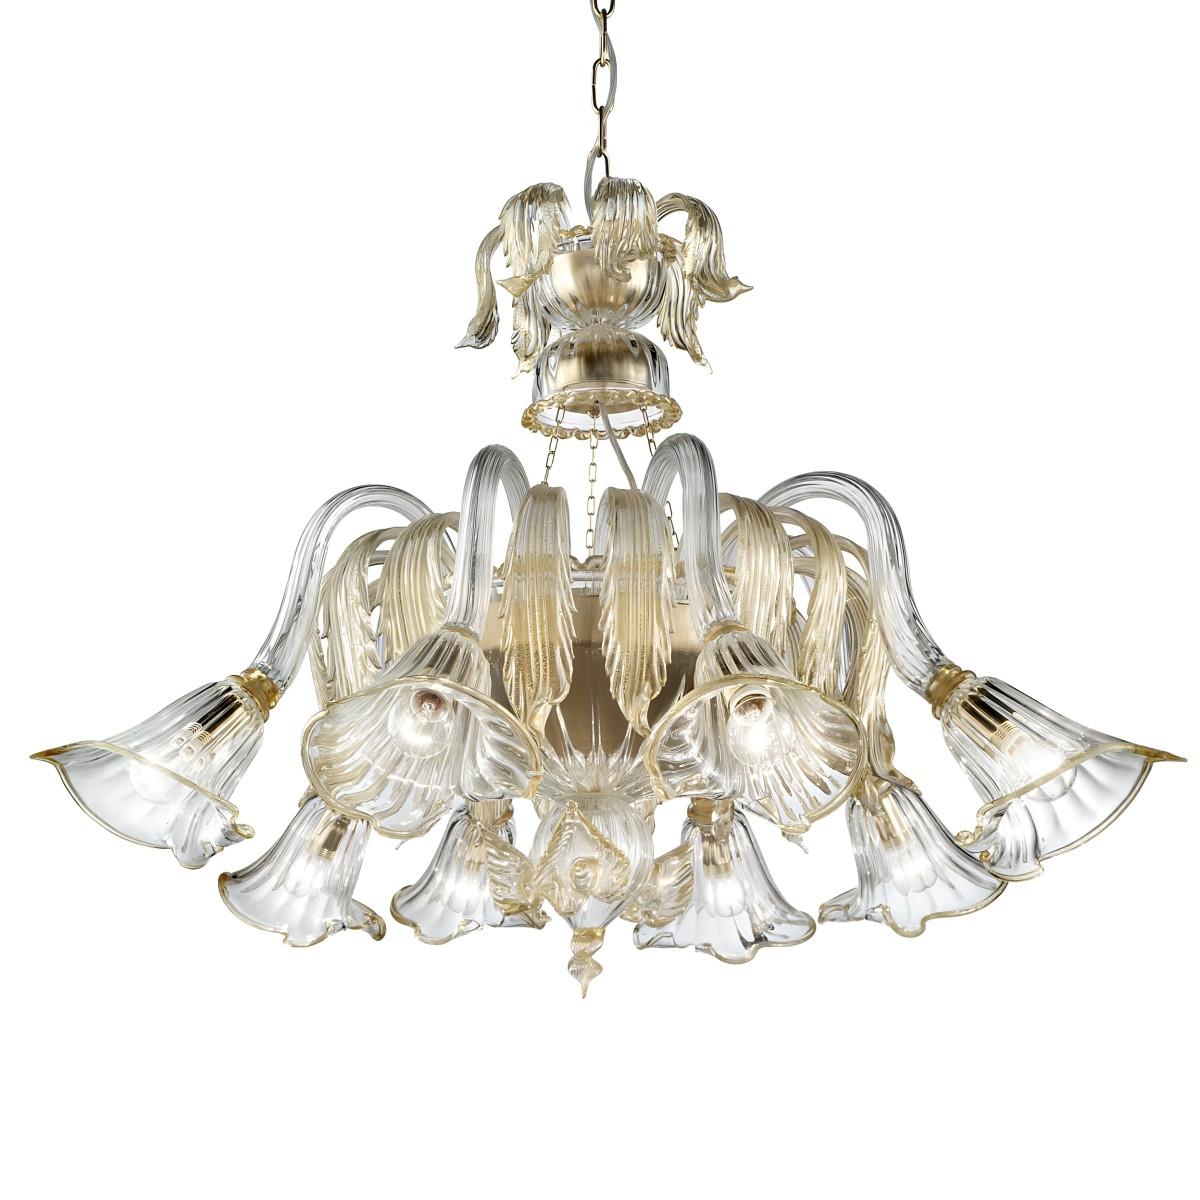 Laguna 8 luces araña de Murano forma de cesta - color transparente oro